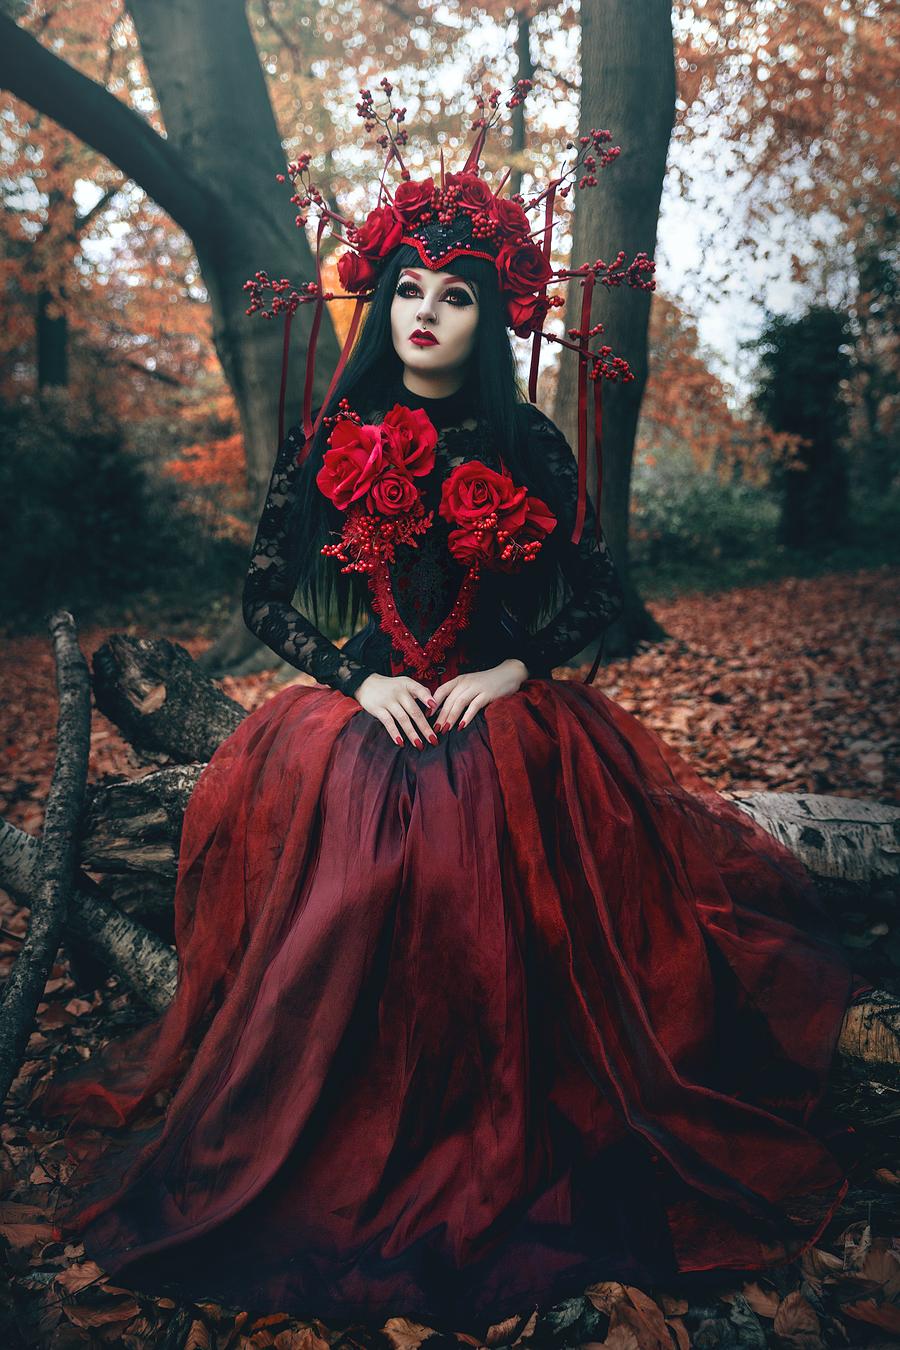 By Alex Kie / Photography by Alex Kie, Model Elladora, Makeup by Elladora, Post processing by Alex Kie, Designer Valkyrie Corsets / Uploaded 7th July 2018 @ 02:32 PM